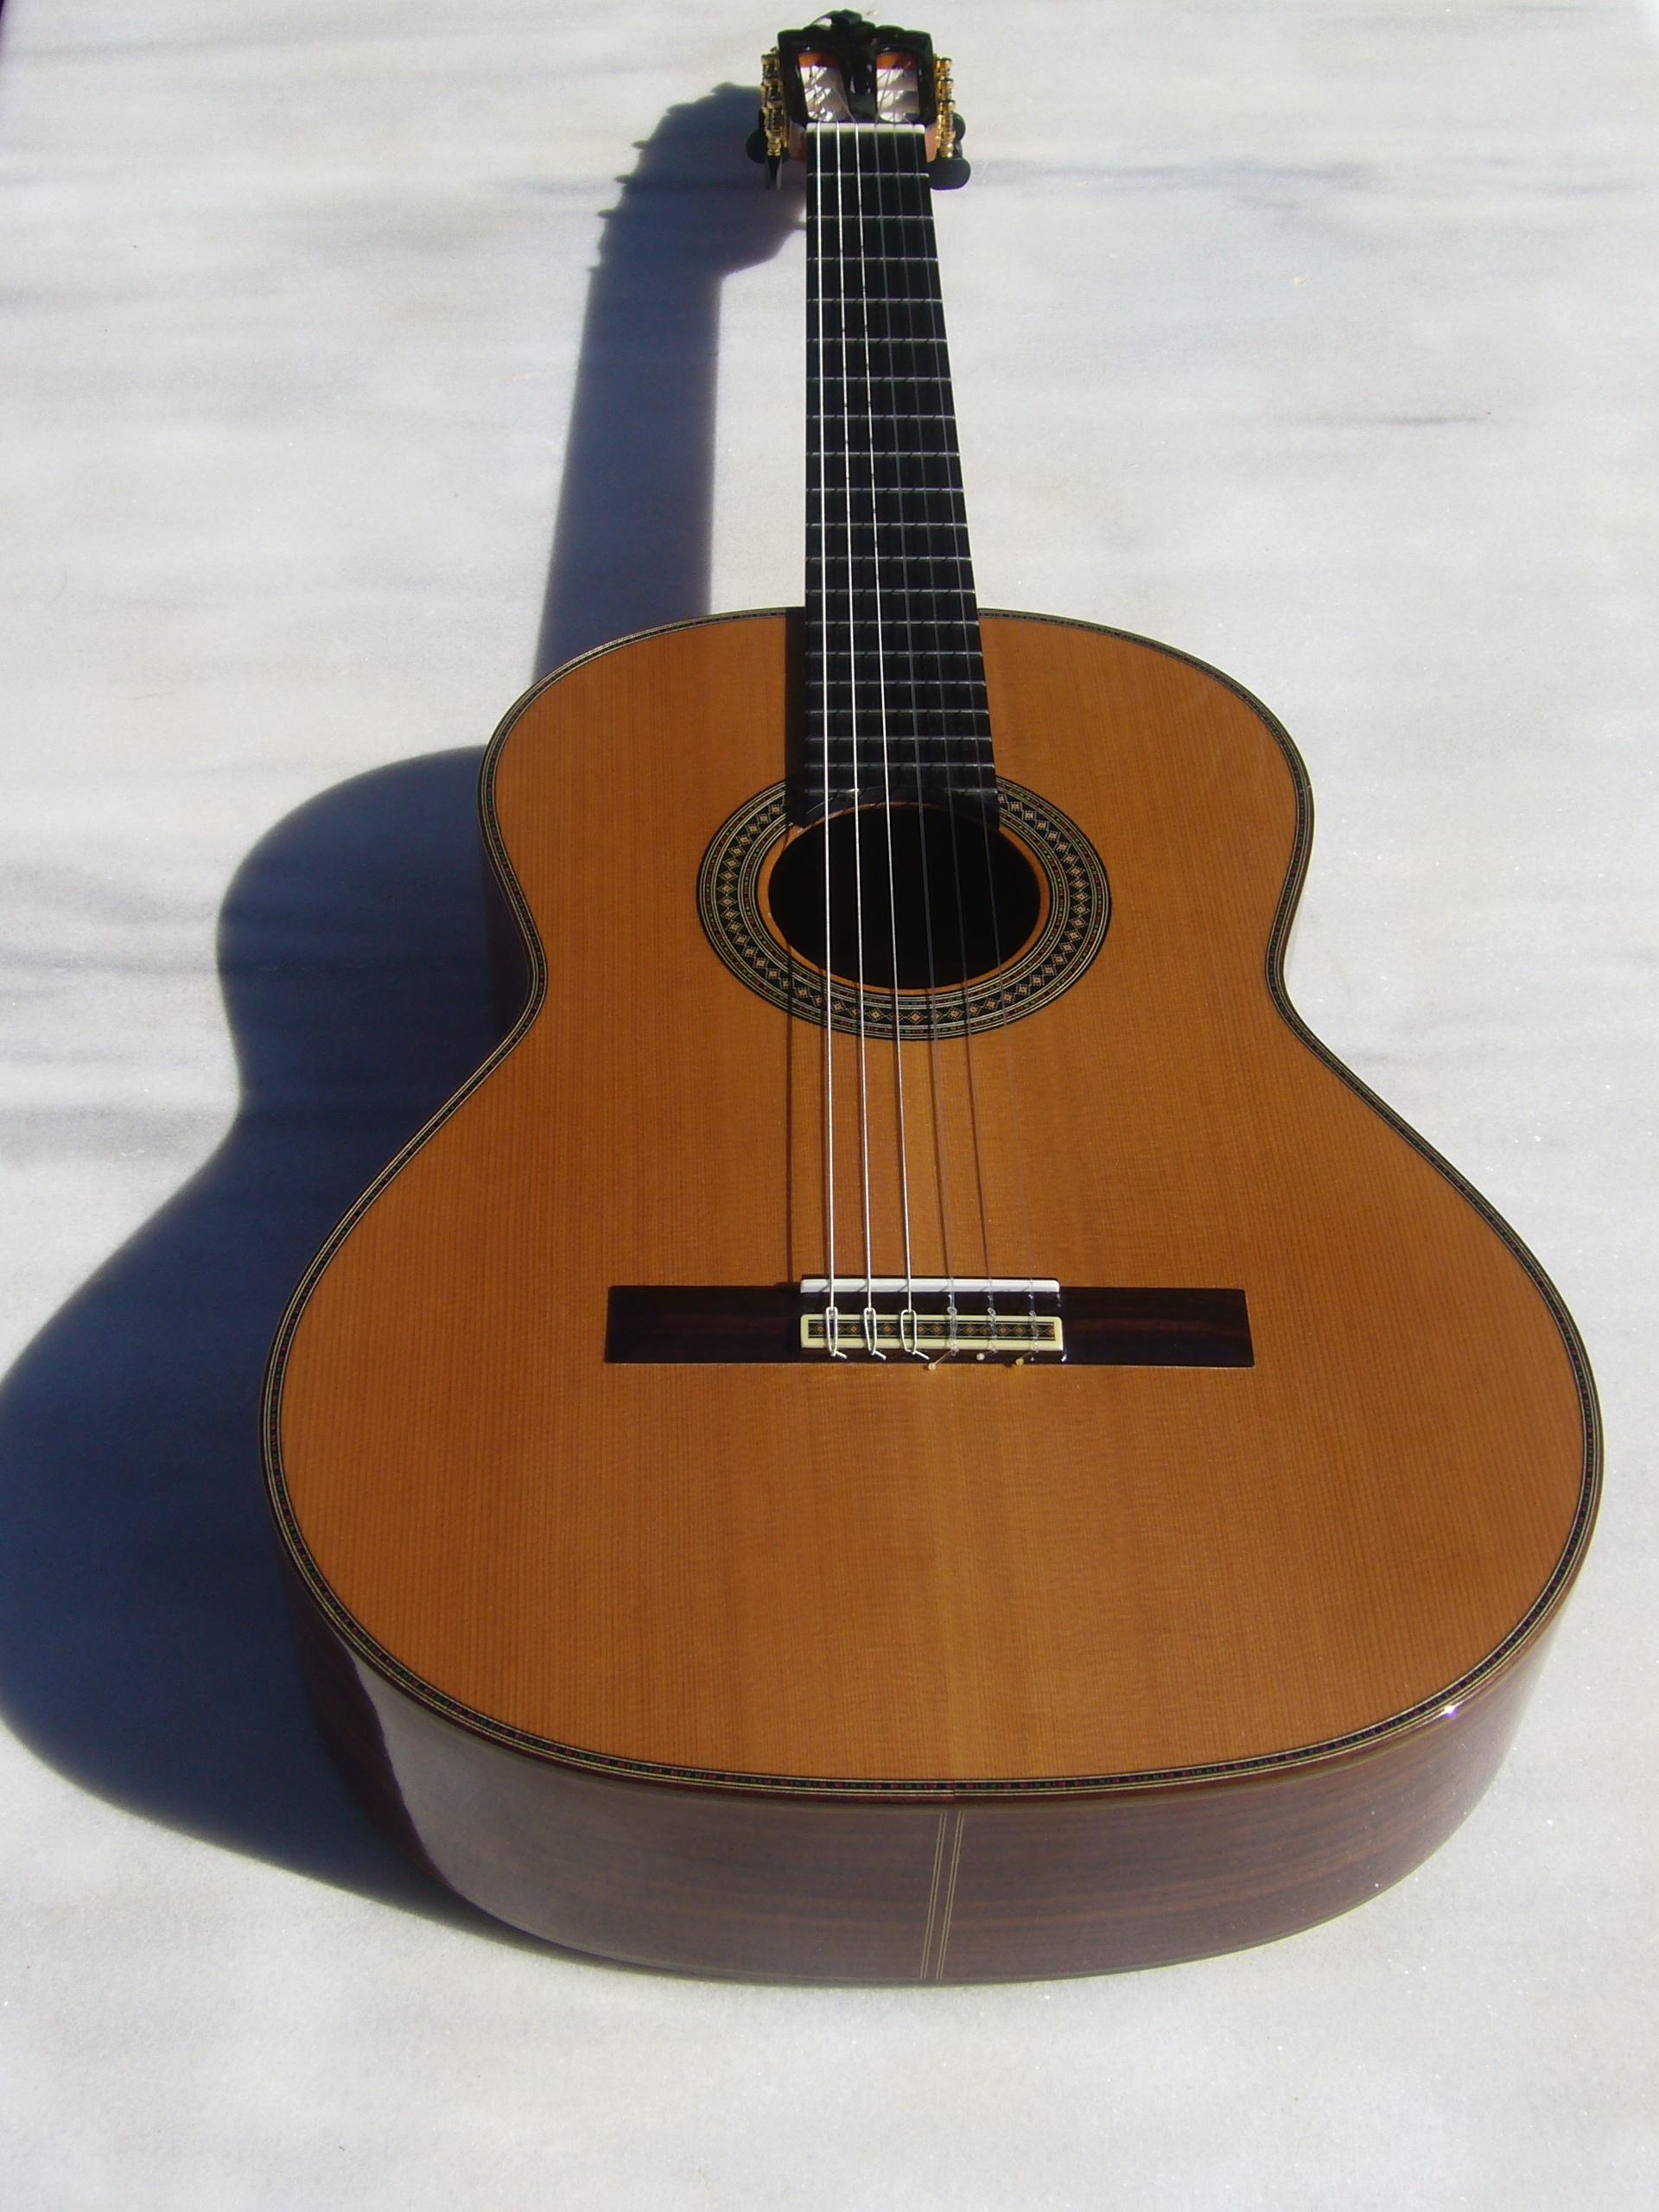 eric-henderson-classical-guitar